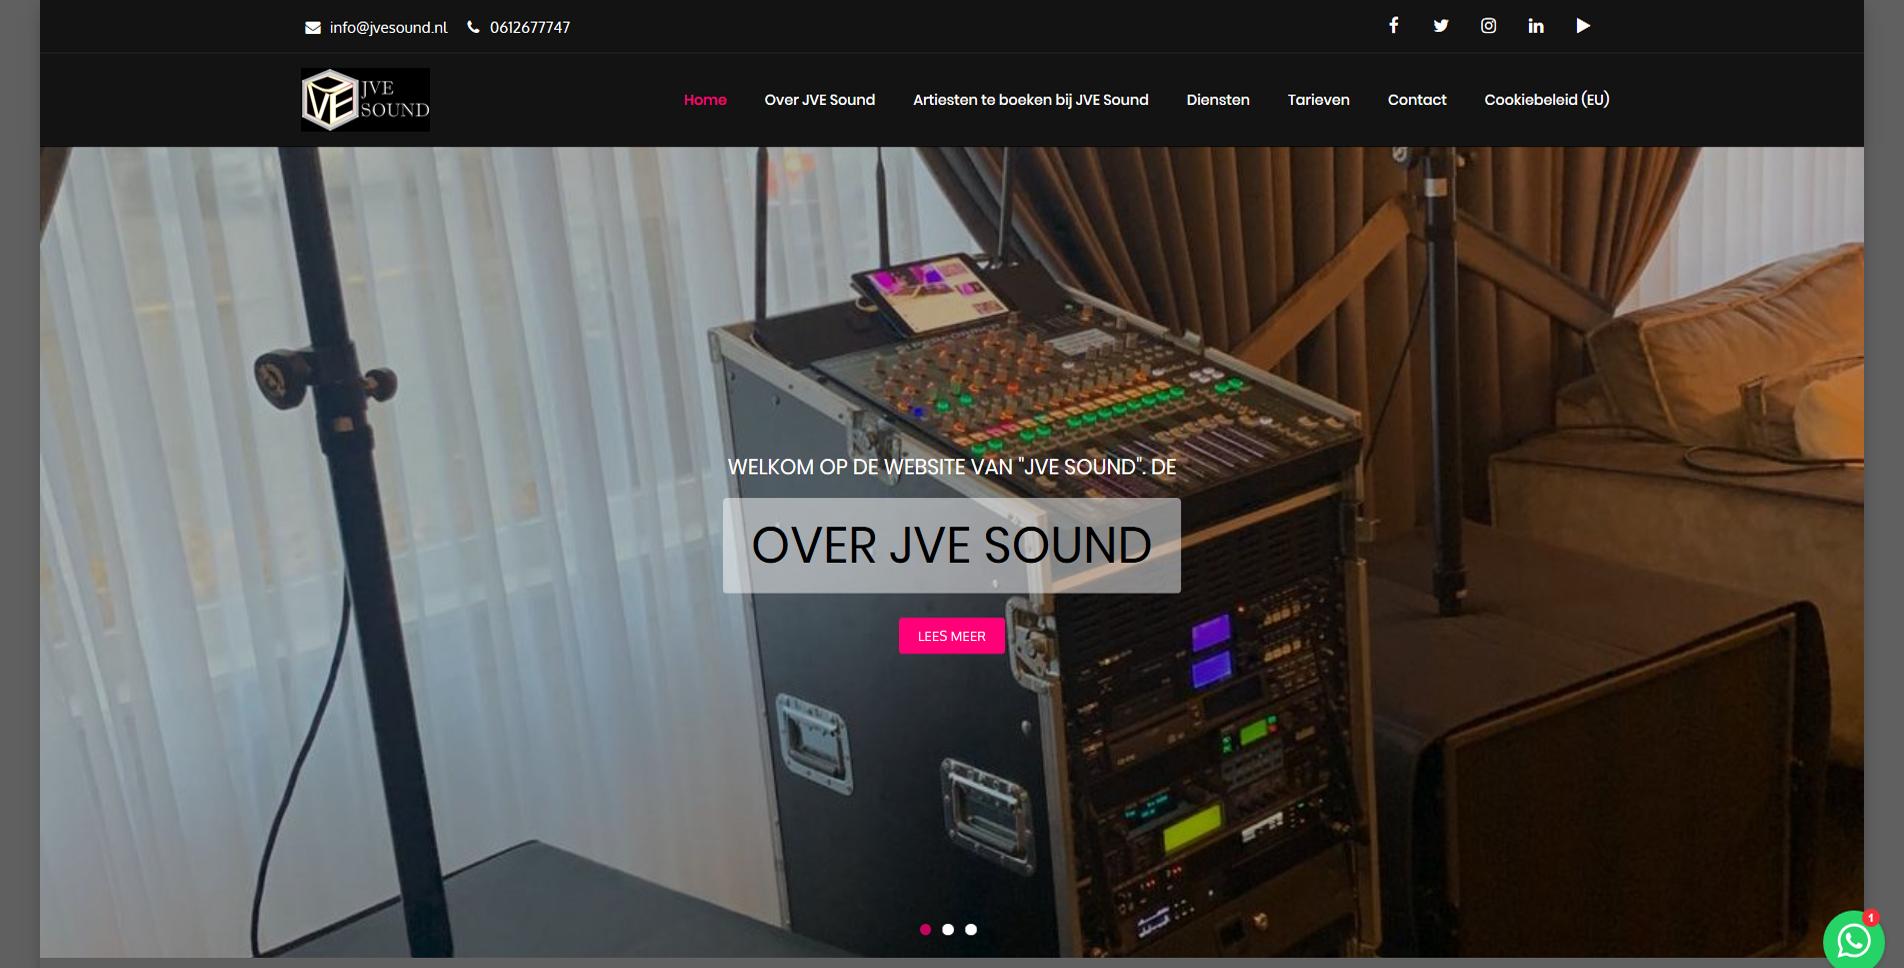 JVE Sound